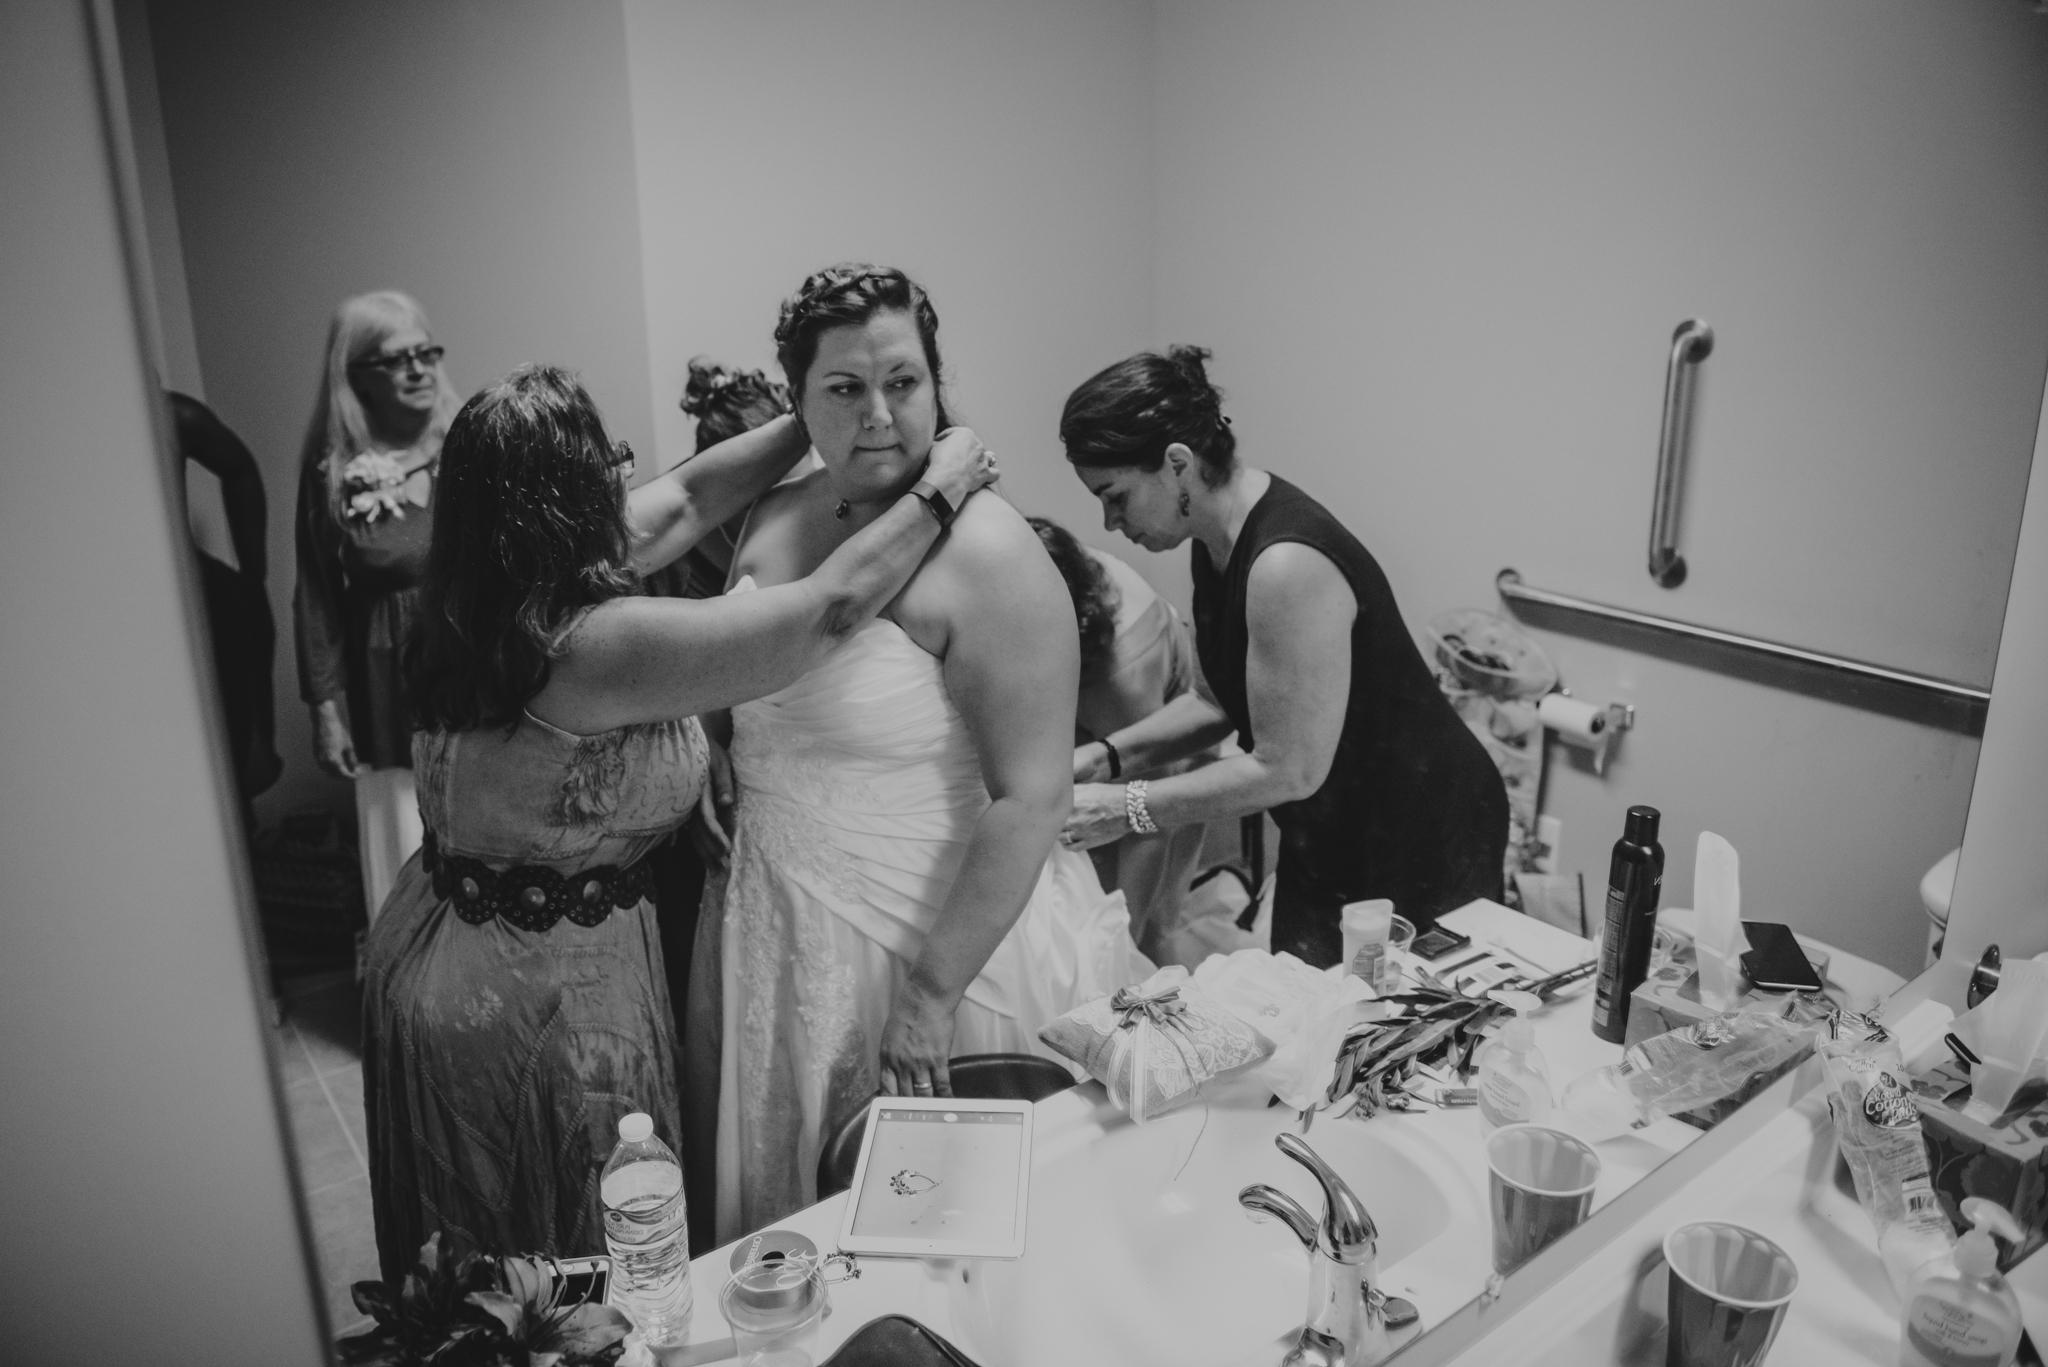 raleigh-wedding-bride-getting-ready-cd-2.jpg